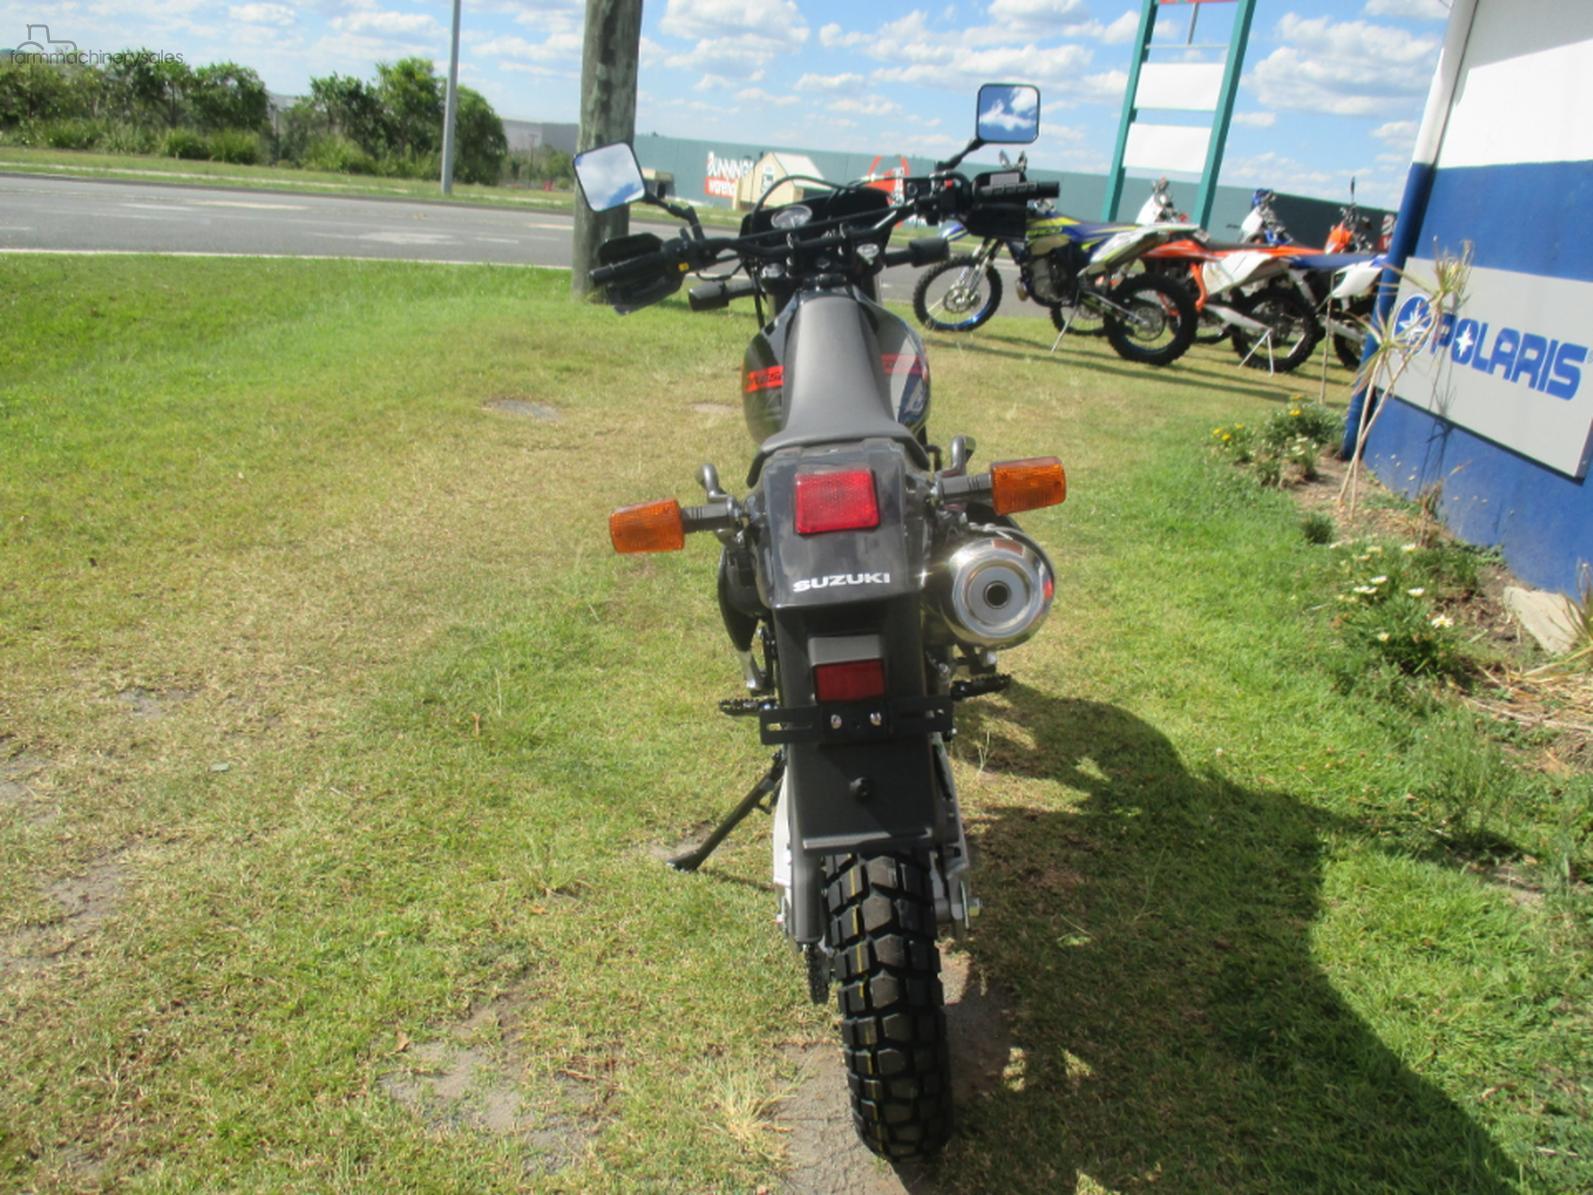 2018 Suzuki DR650SE-OAG-AD-15689057 - farmmachinerysales com au